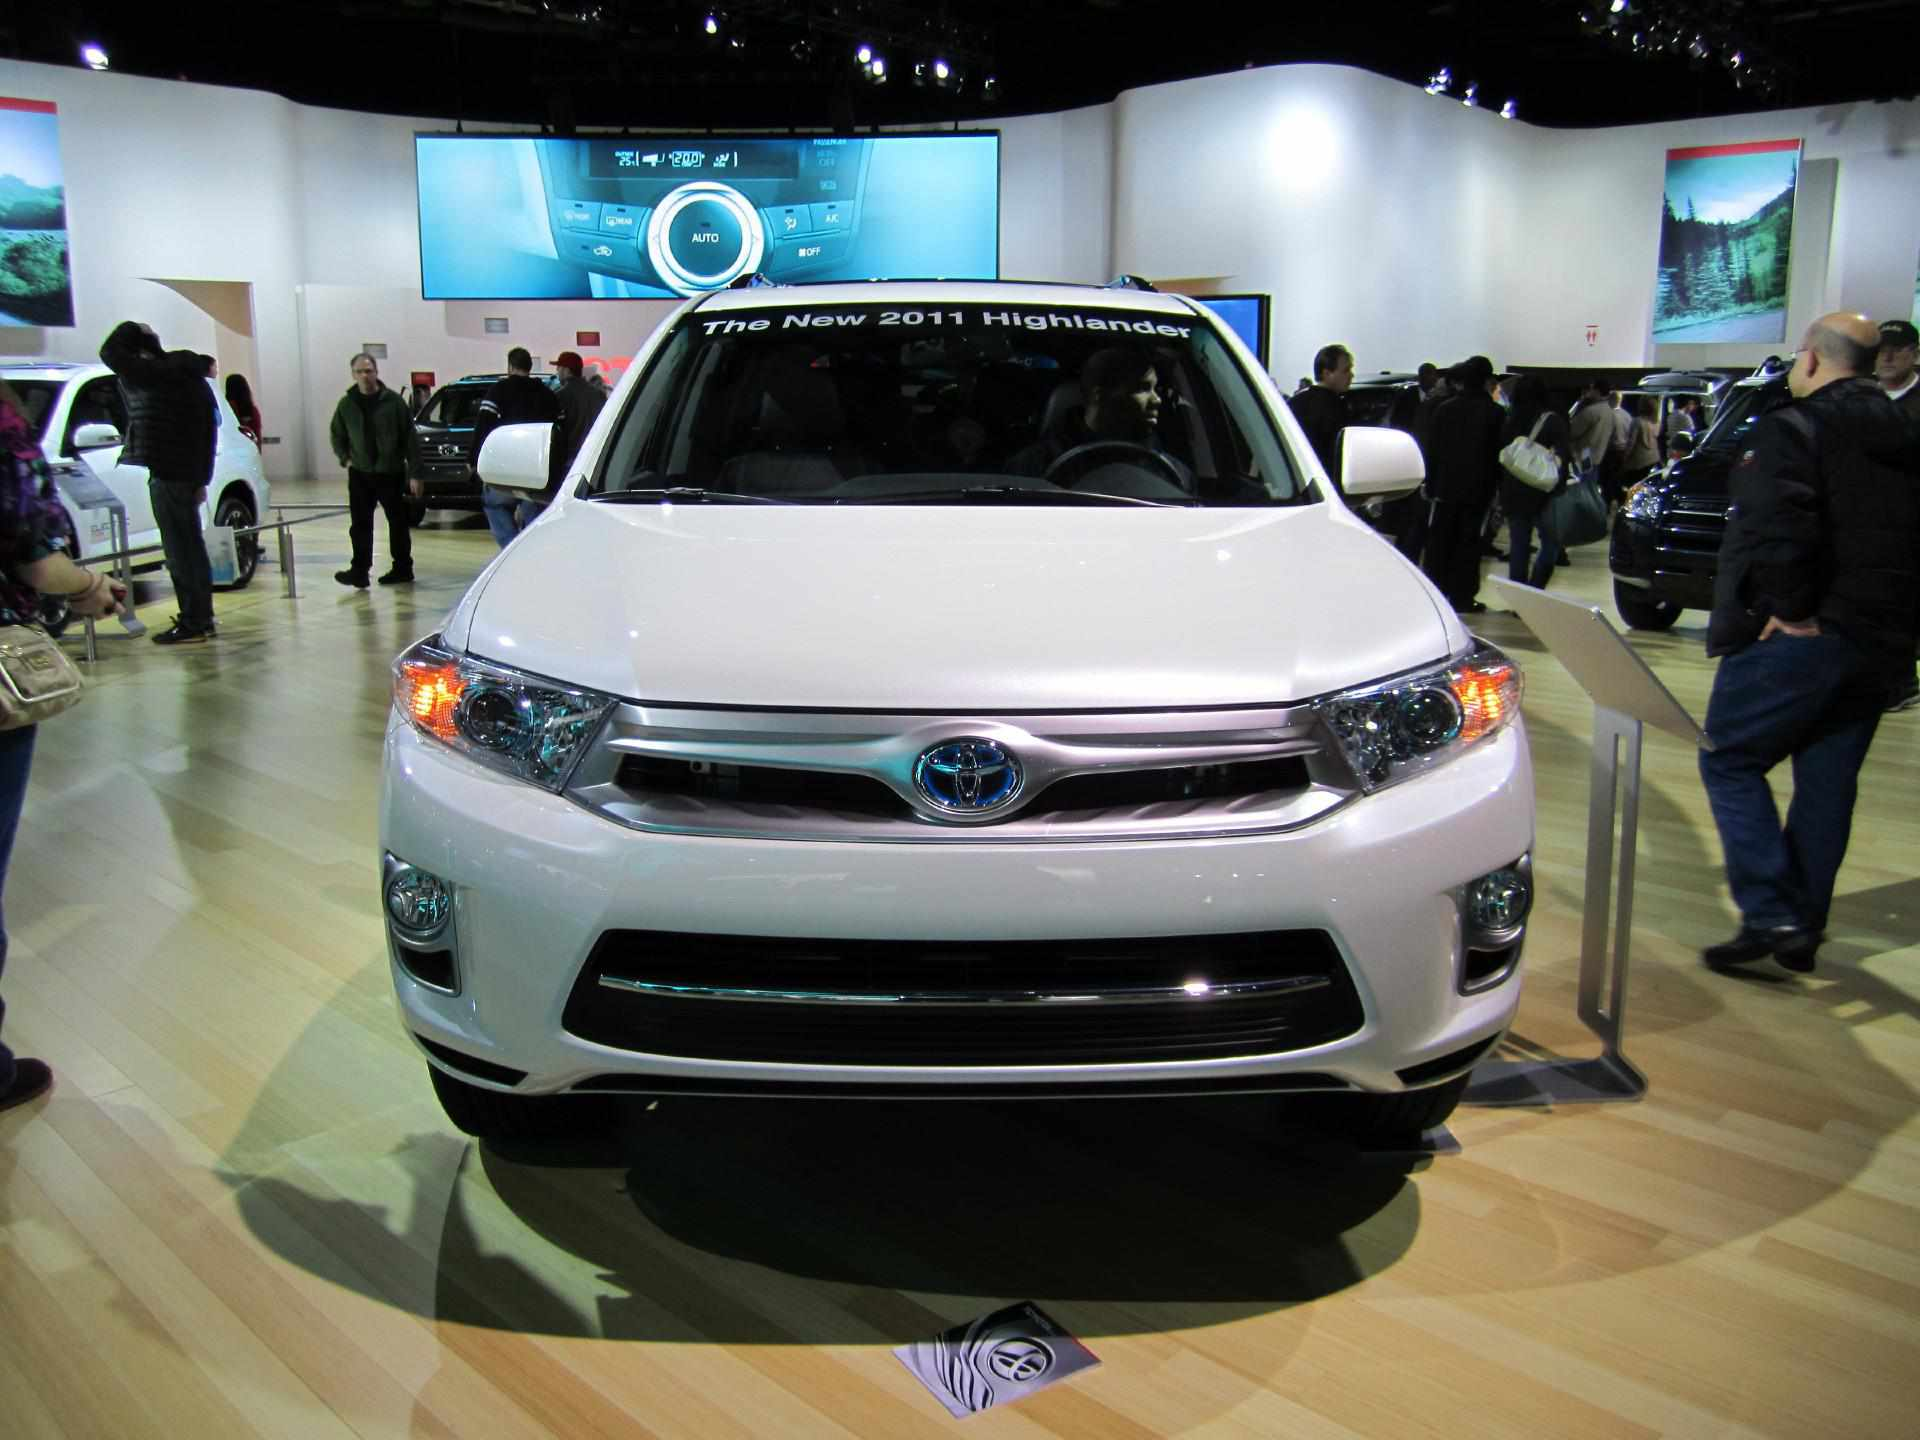 Top 10 Fuel Efficient Suvs 2011 Jeep Patriot Filter Introduction The